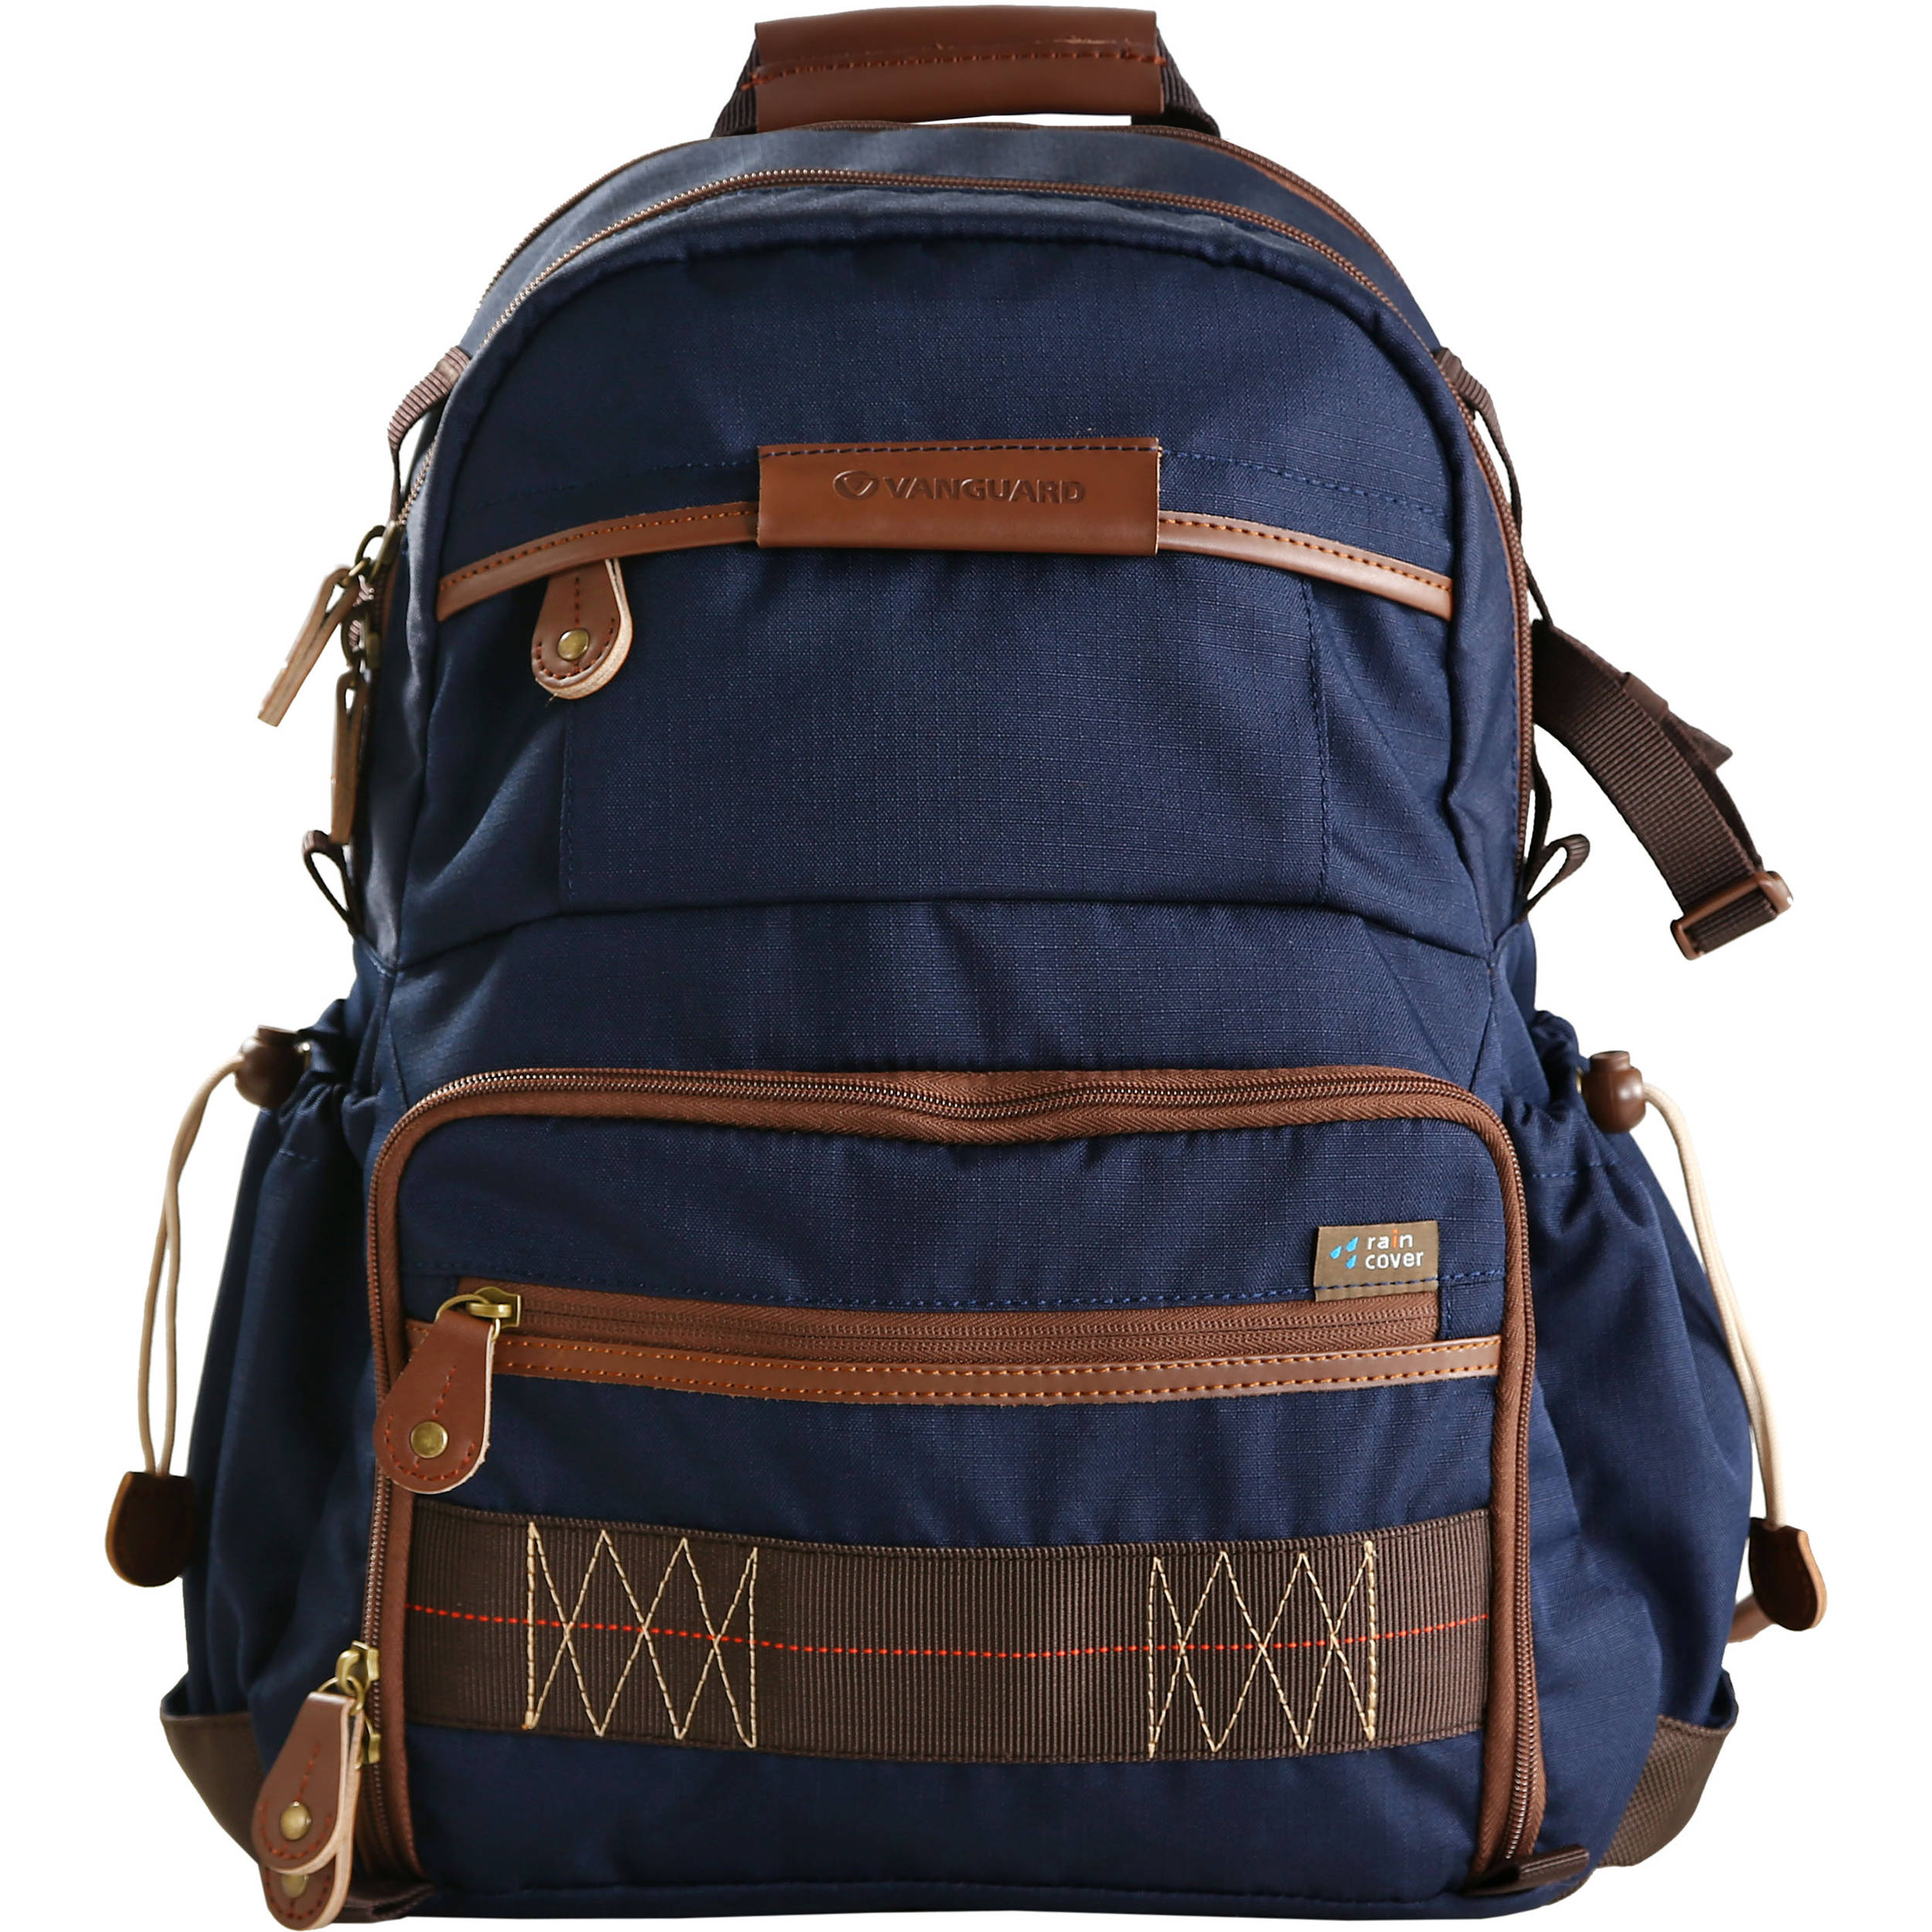 c1692da549 Vanguard Havana 41-Backpack (Blue) HAVANA 41BL B H Photo Video